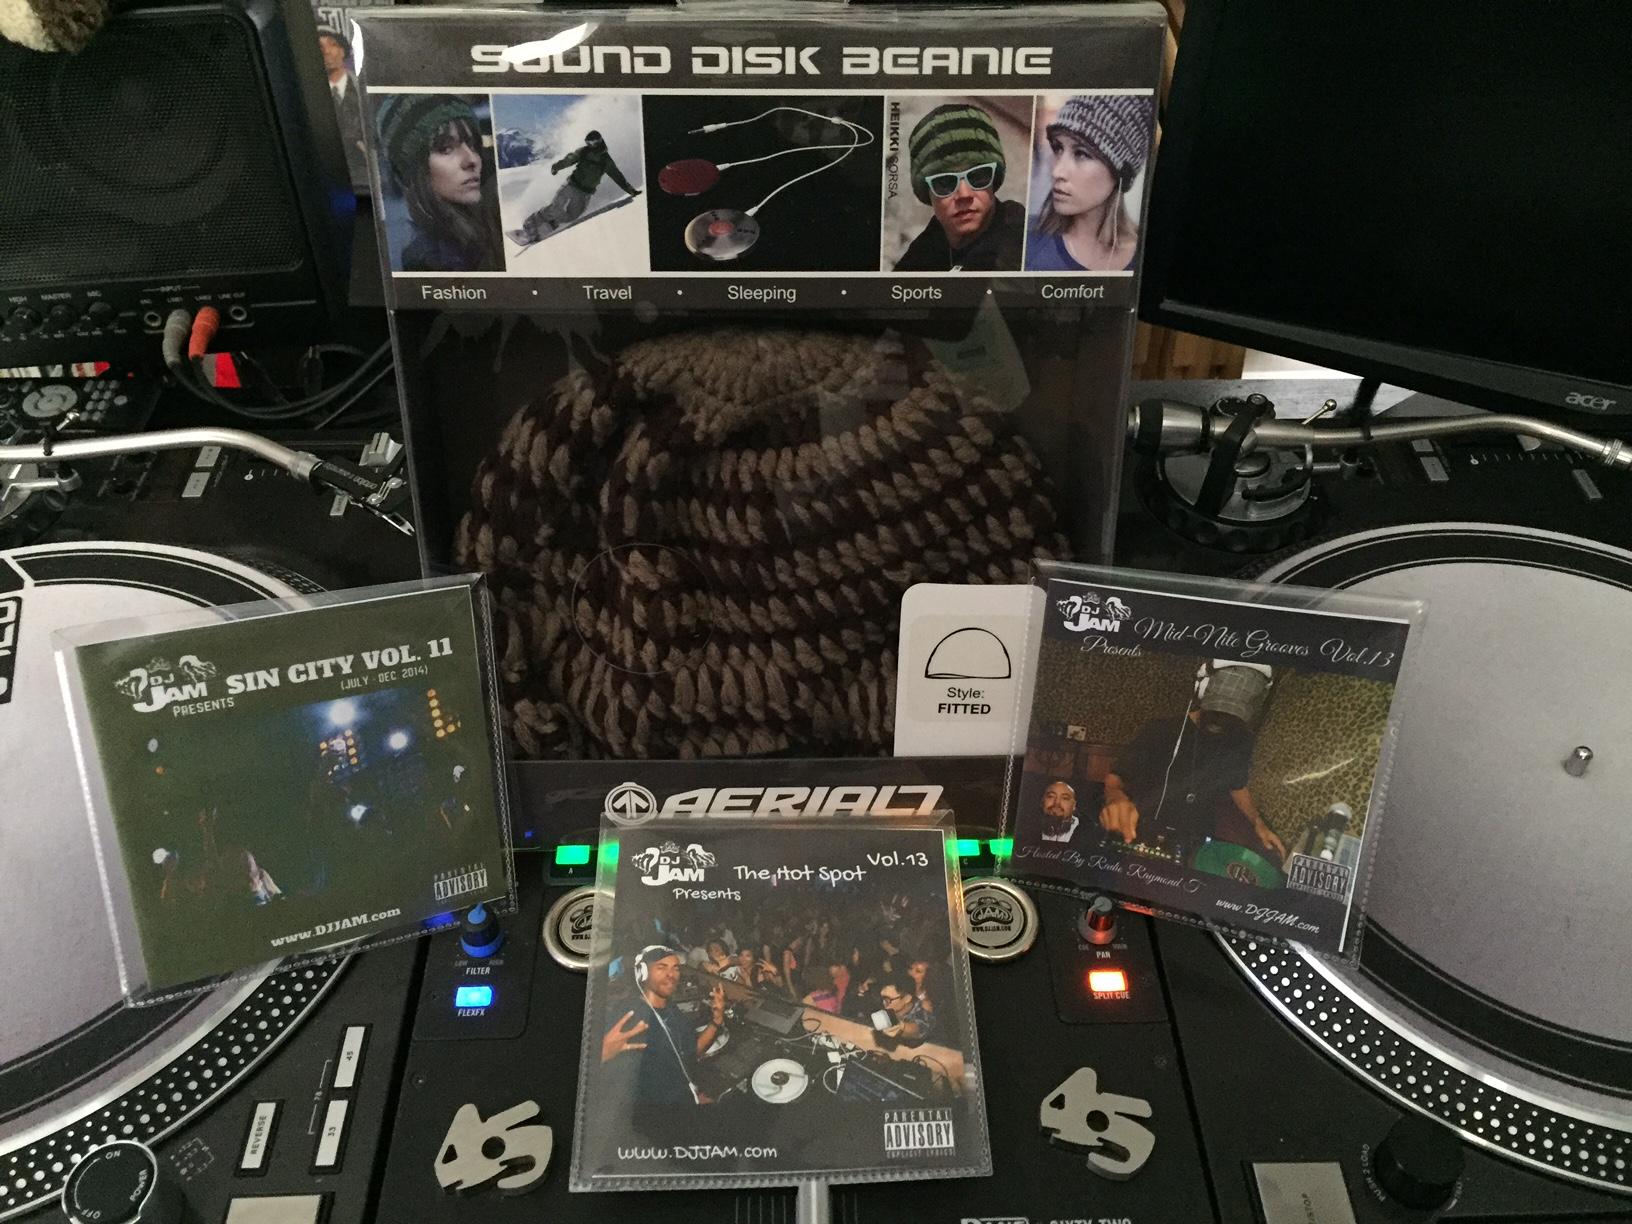 Aerial 7 Headphone/Beanie & DJ Jam mix CD pack Holiday giveaway #2